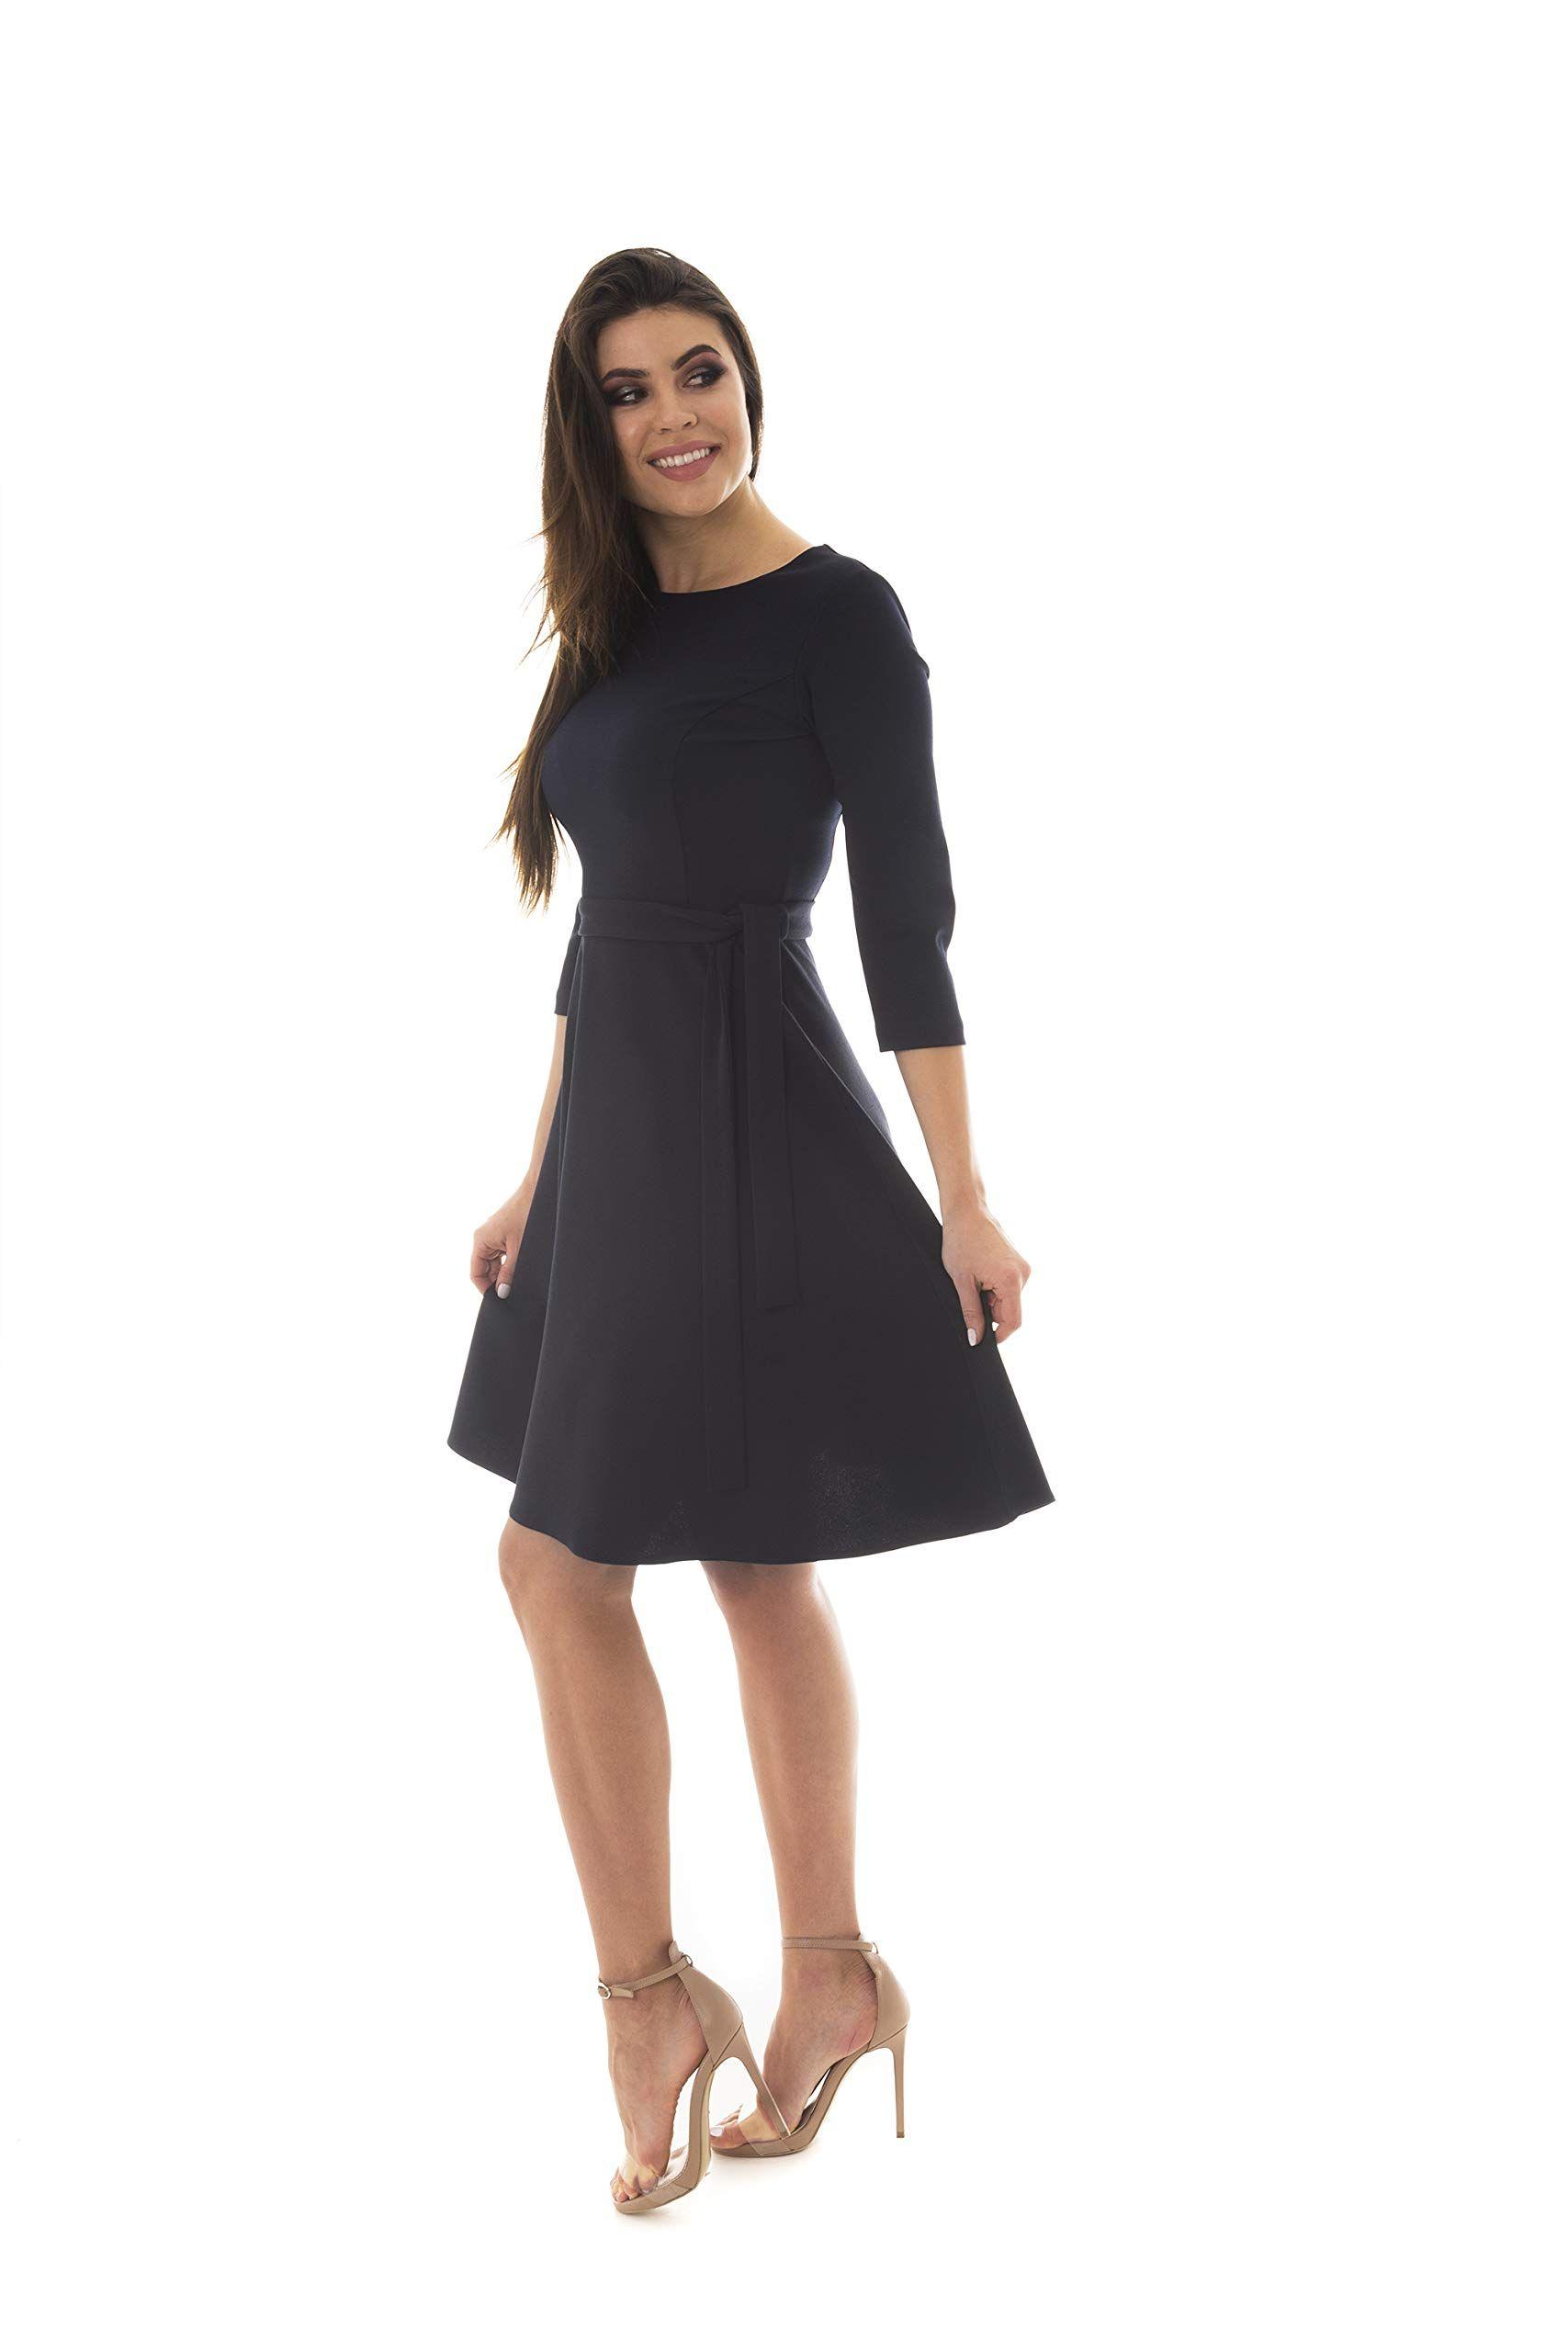 7431d2d12392a Women's Elegant Modest 3/4 Sleeve Crewneck Belted Semi Formal Midi Work  Office Dress